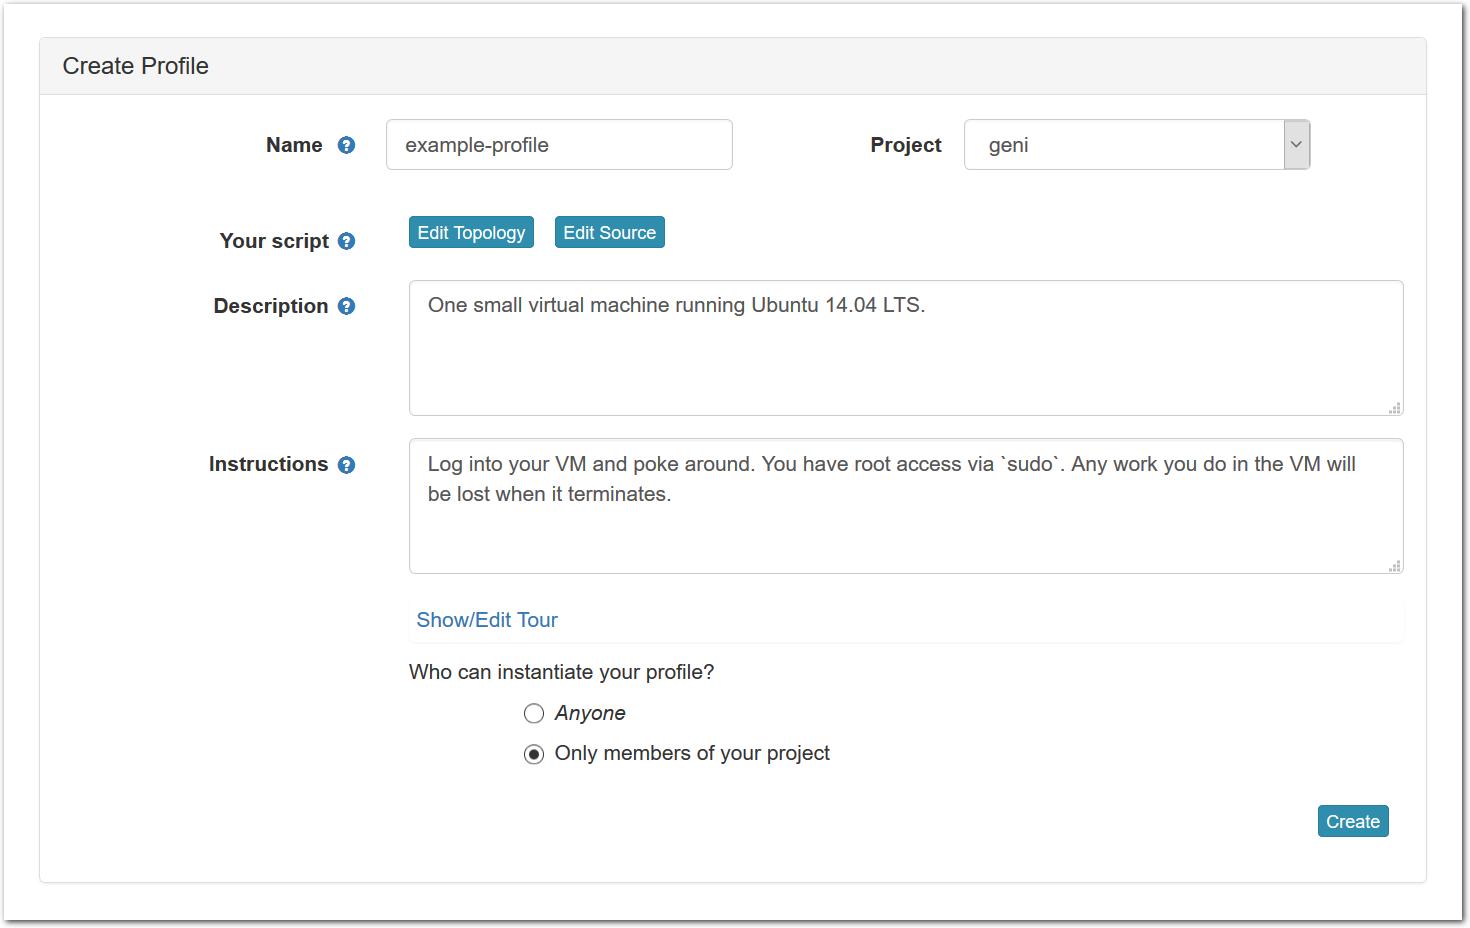 screenshots/elab/create-profile-form.png